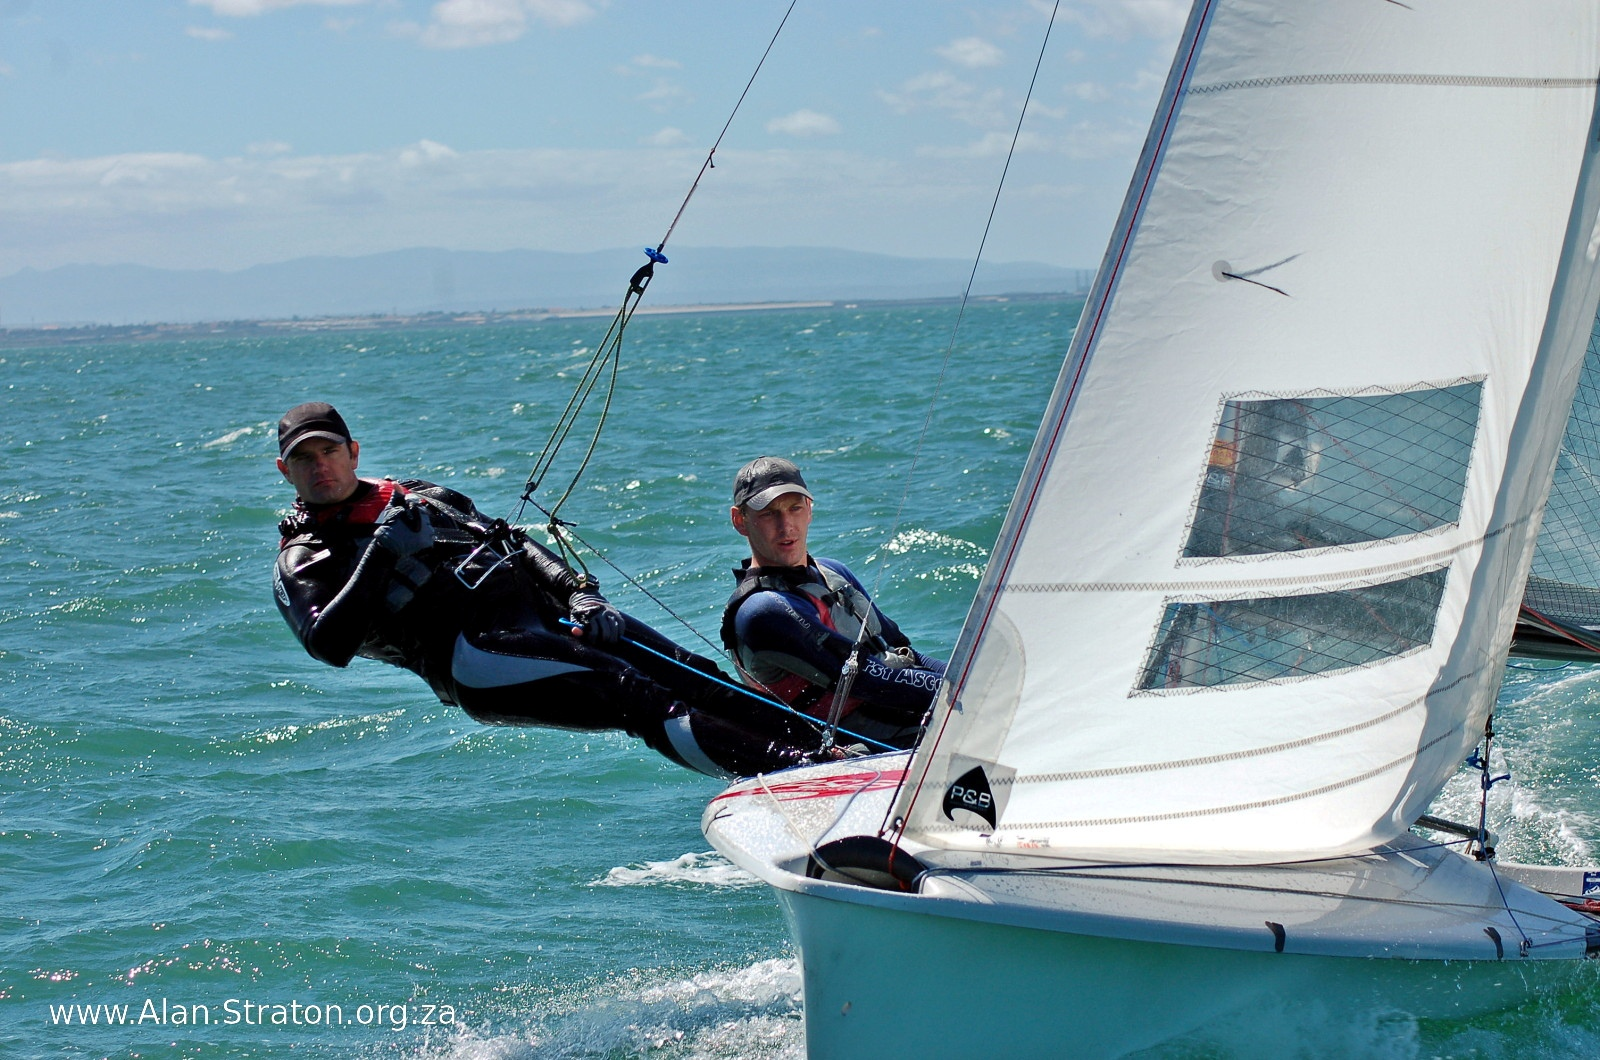 Globe's best sailors in action in Port Elizabeth